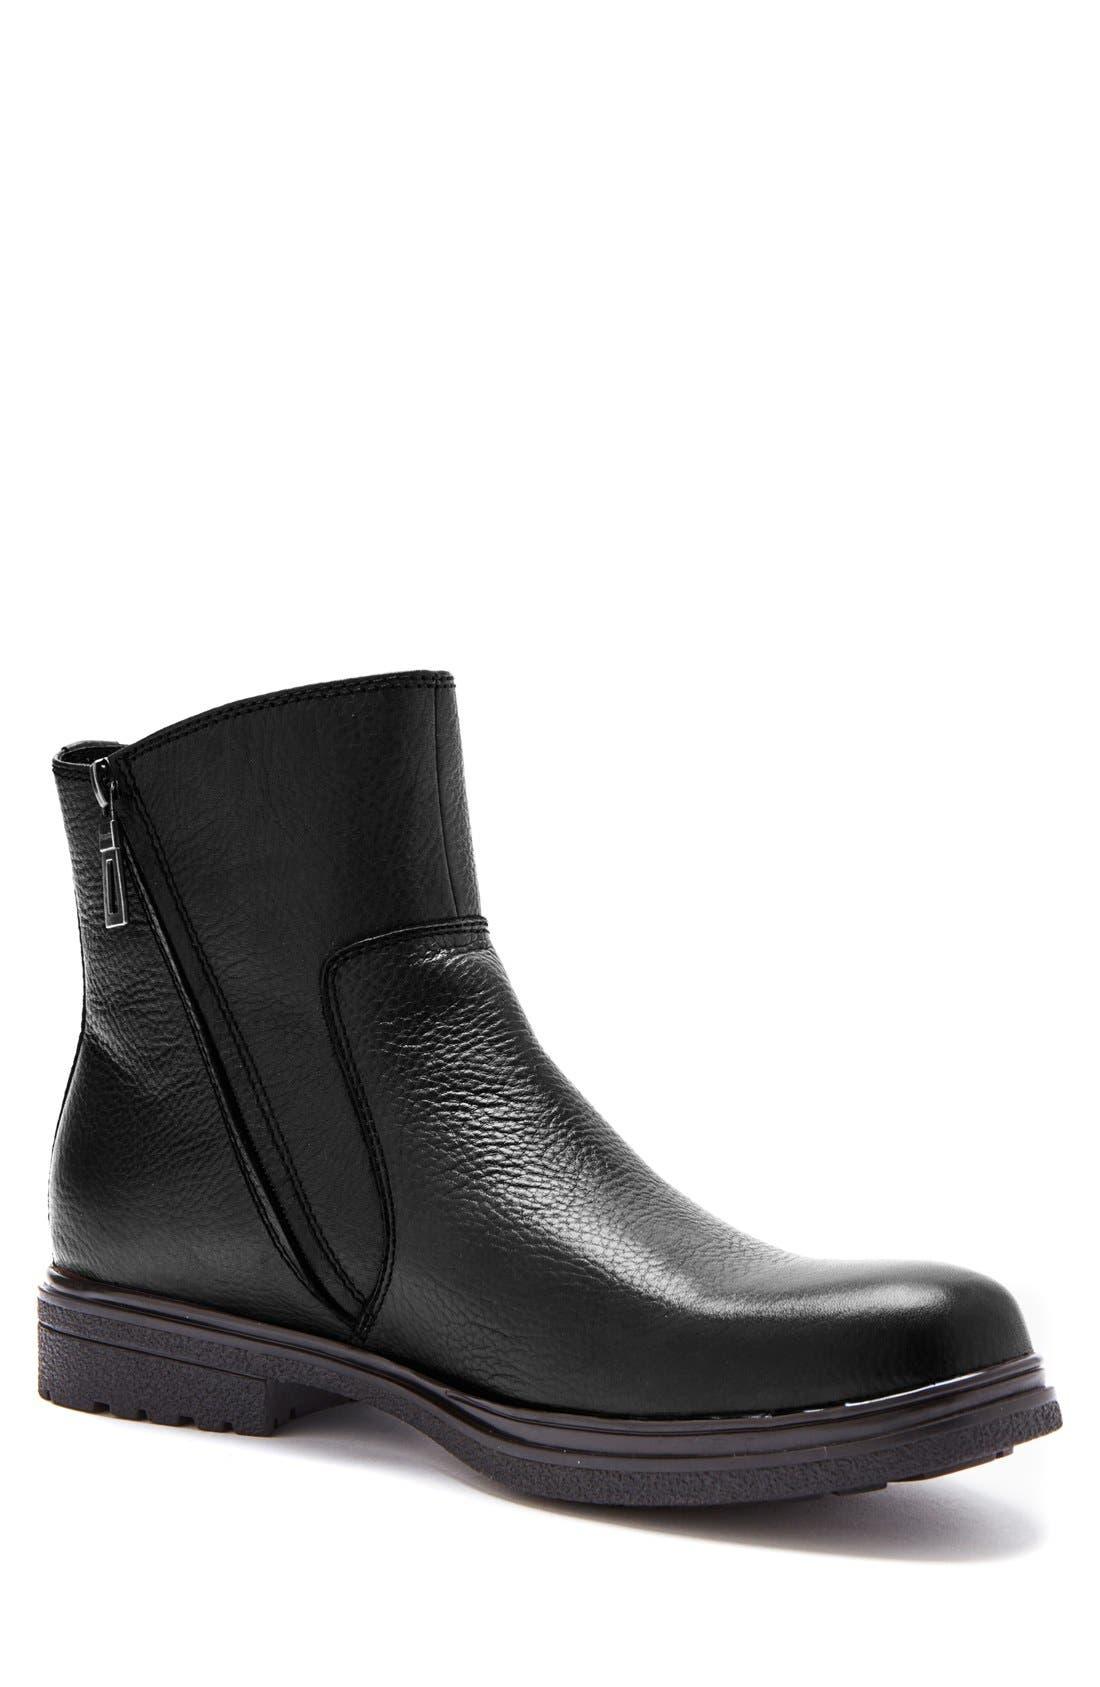 'Brawn' Waterproof Zip Boot,                         Main,                         color, 001